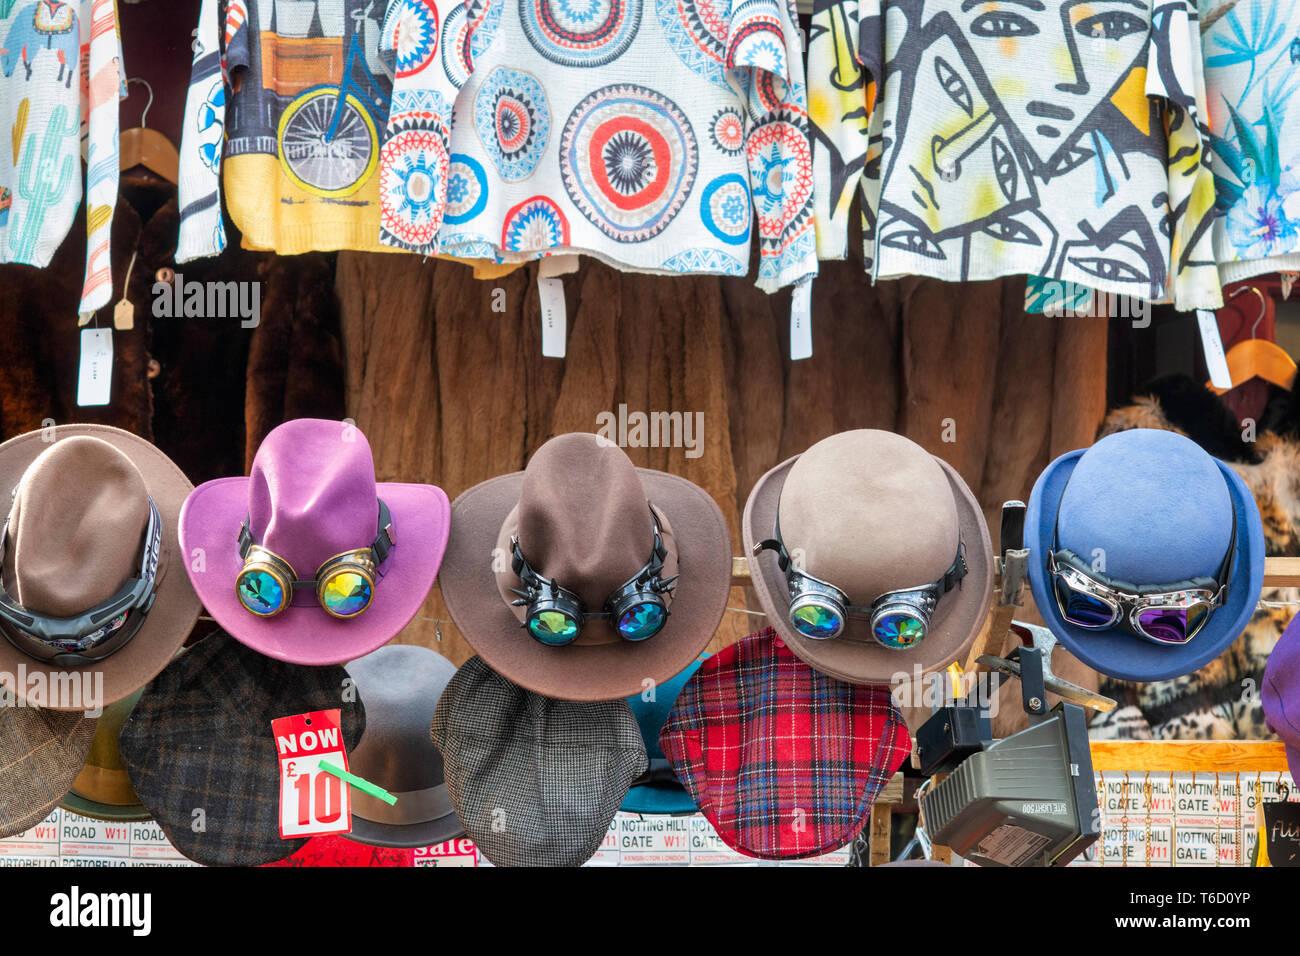 6a16124eaa4df Bowler Hats London Stock Photos   Bowler Hats London Stock Images ...